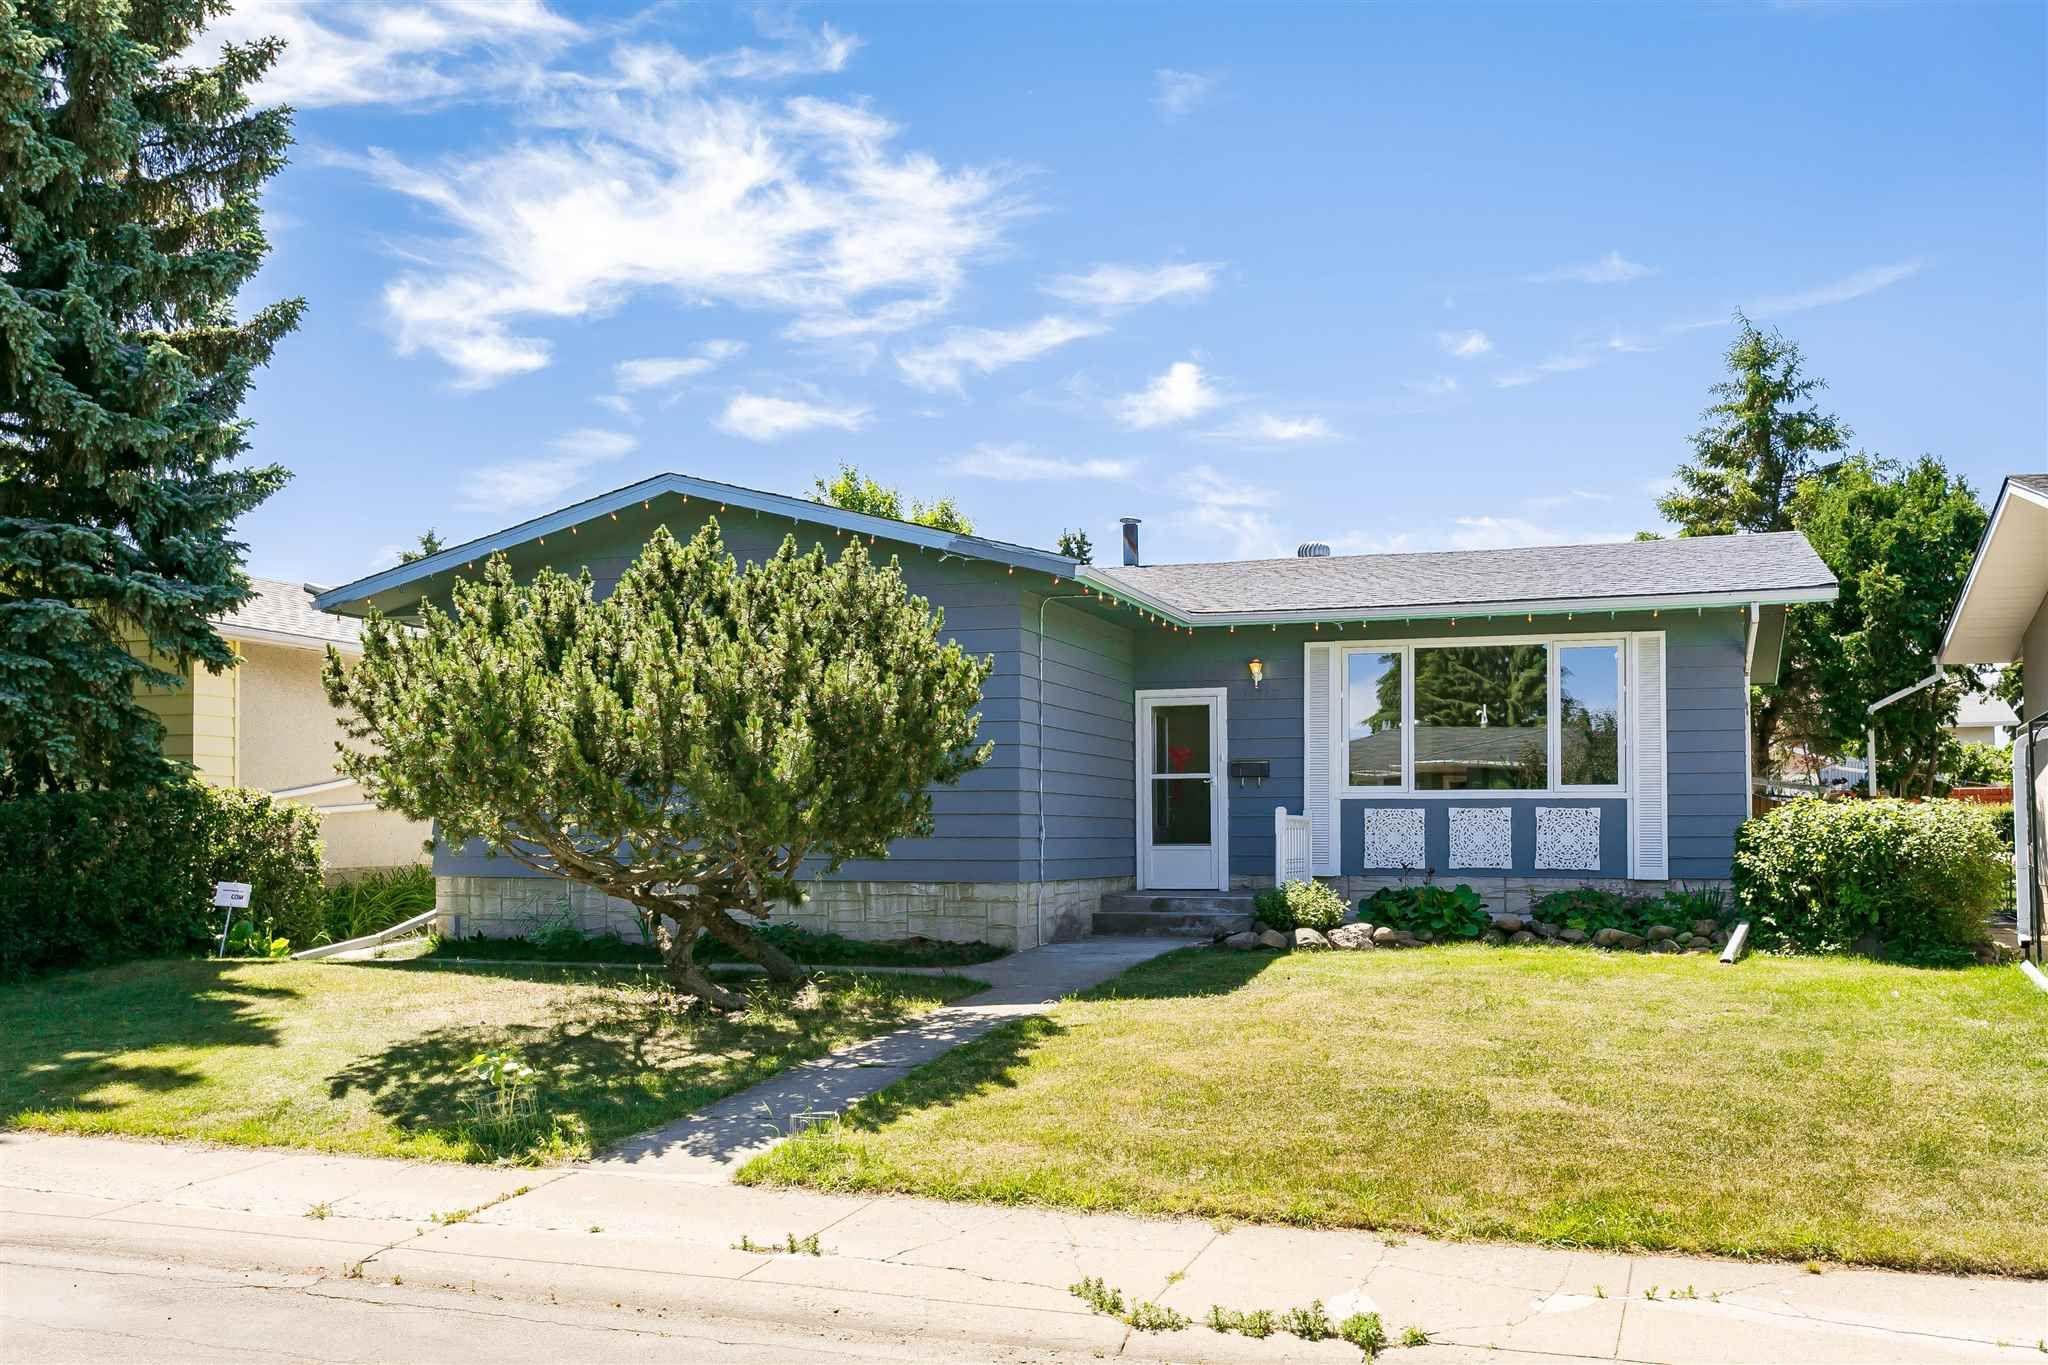 Main Photo: 11715 39 Avenue in Edmonton: Zone 16 House for sale : MLS®# E4253601